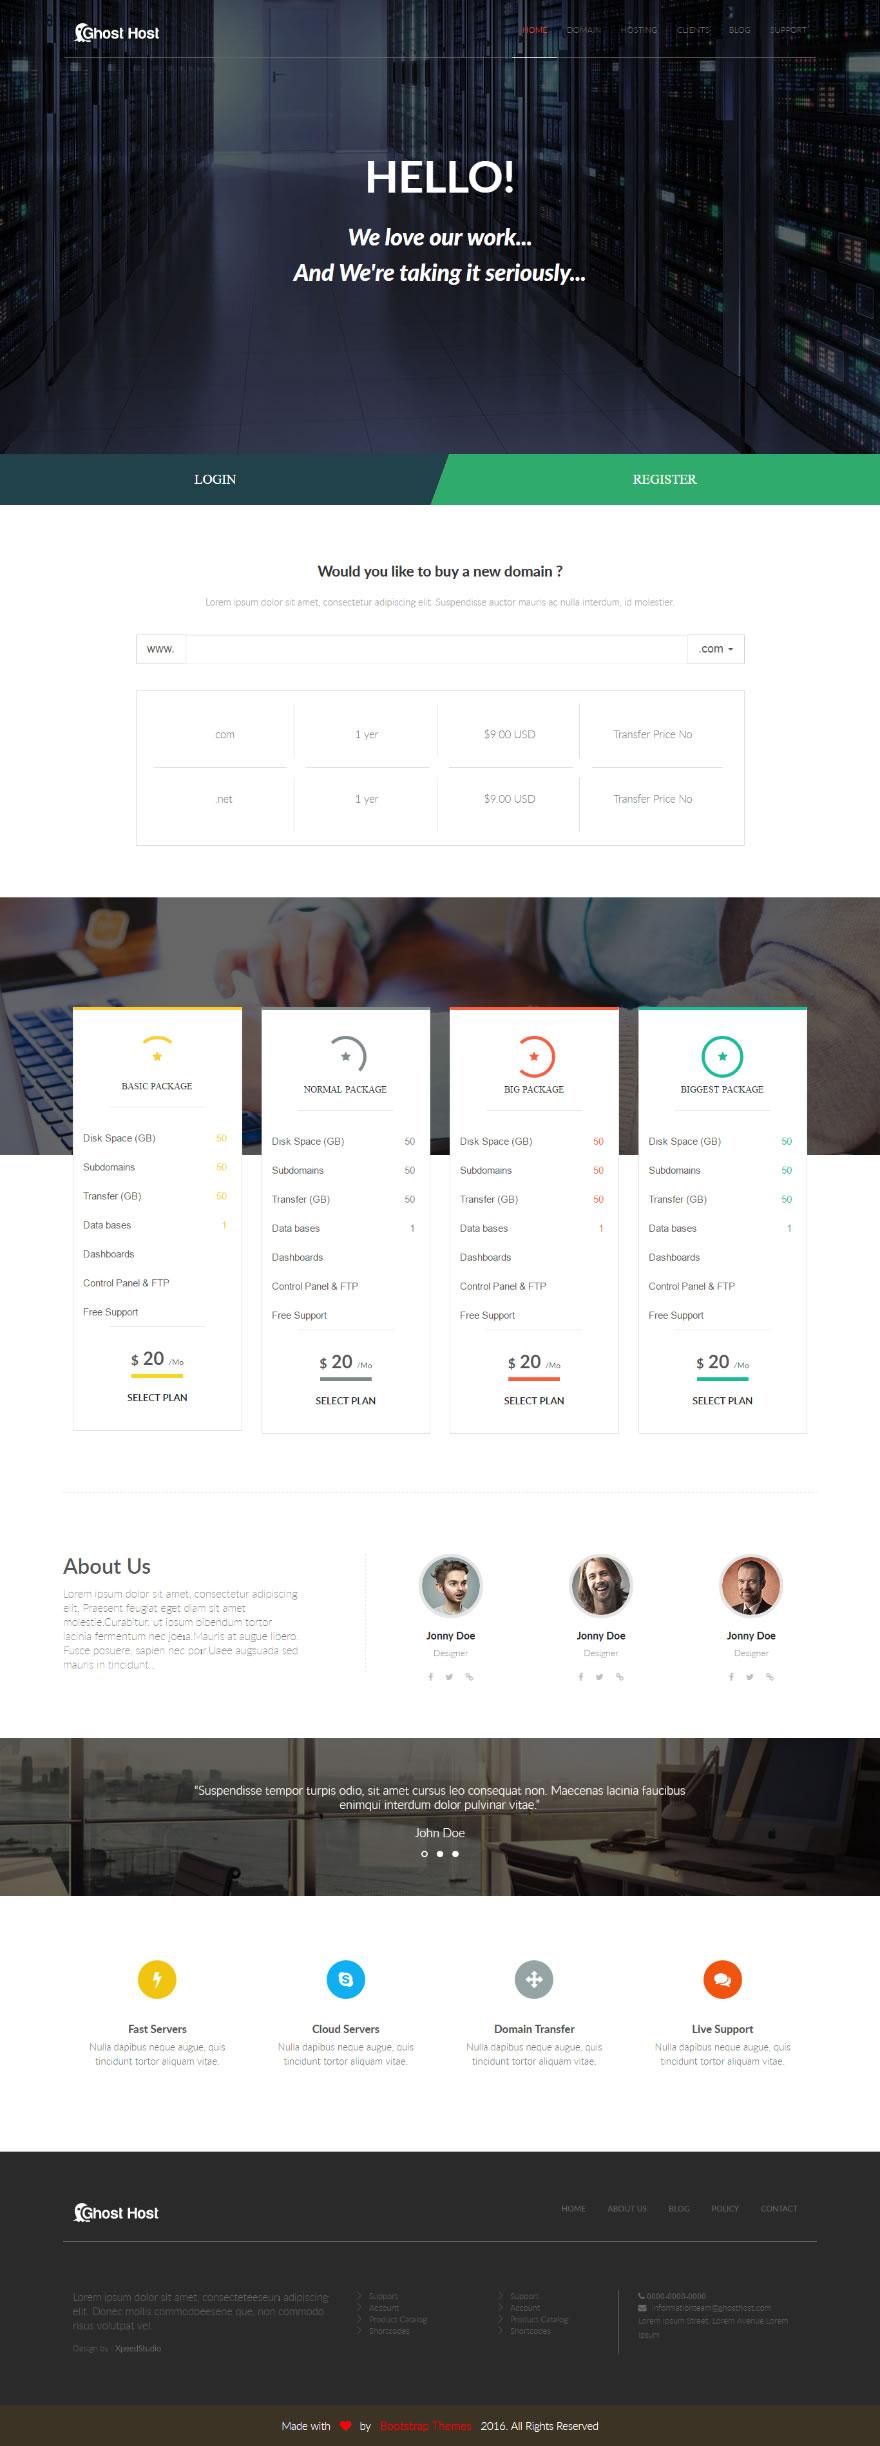 Github bootstrapthemescoghost host one page free hosting template gost host one page free template maxwellsz